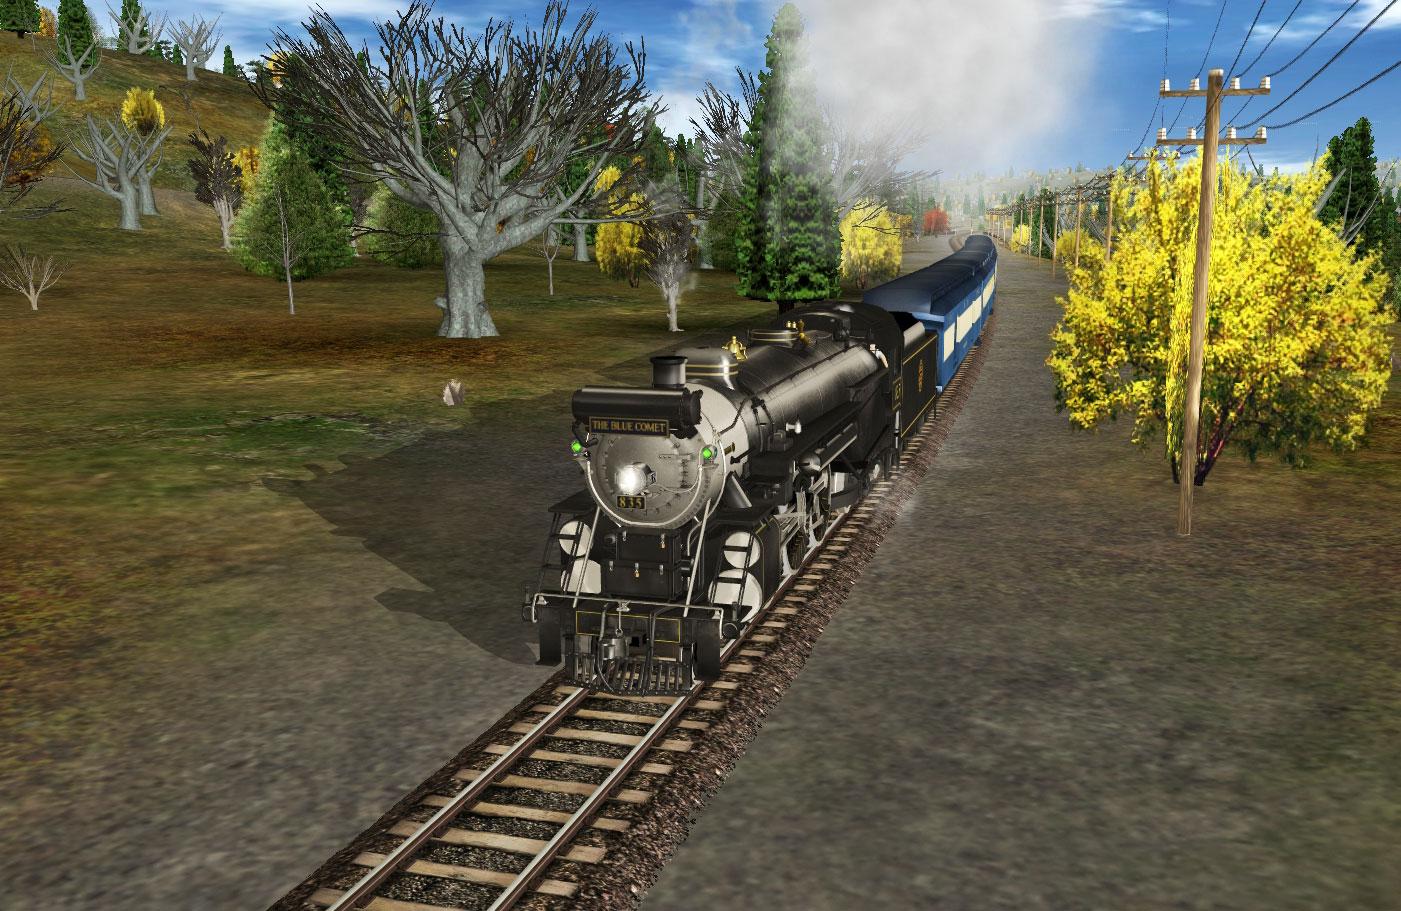 Trainz Simulator DLC Blue Comet Buy and download on  : screenshot1401911SSTLV64 from gamersgate.com size 1401 x 911 jpeg 352kB